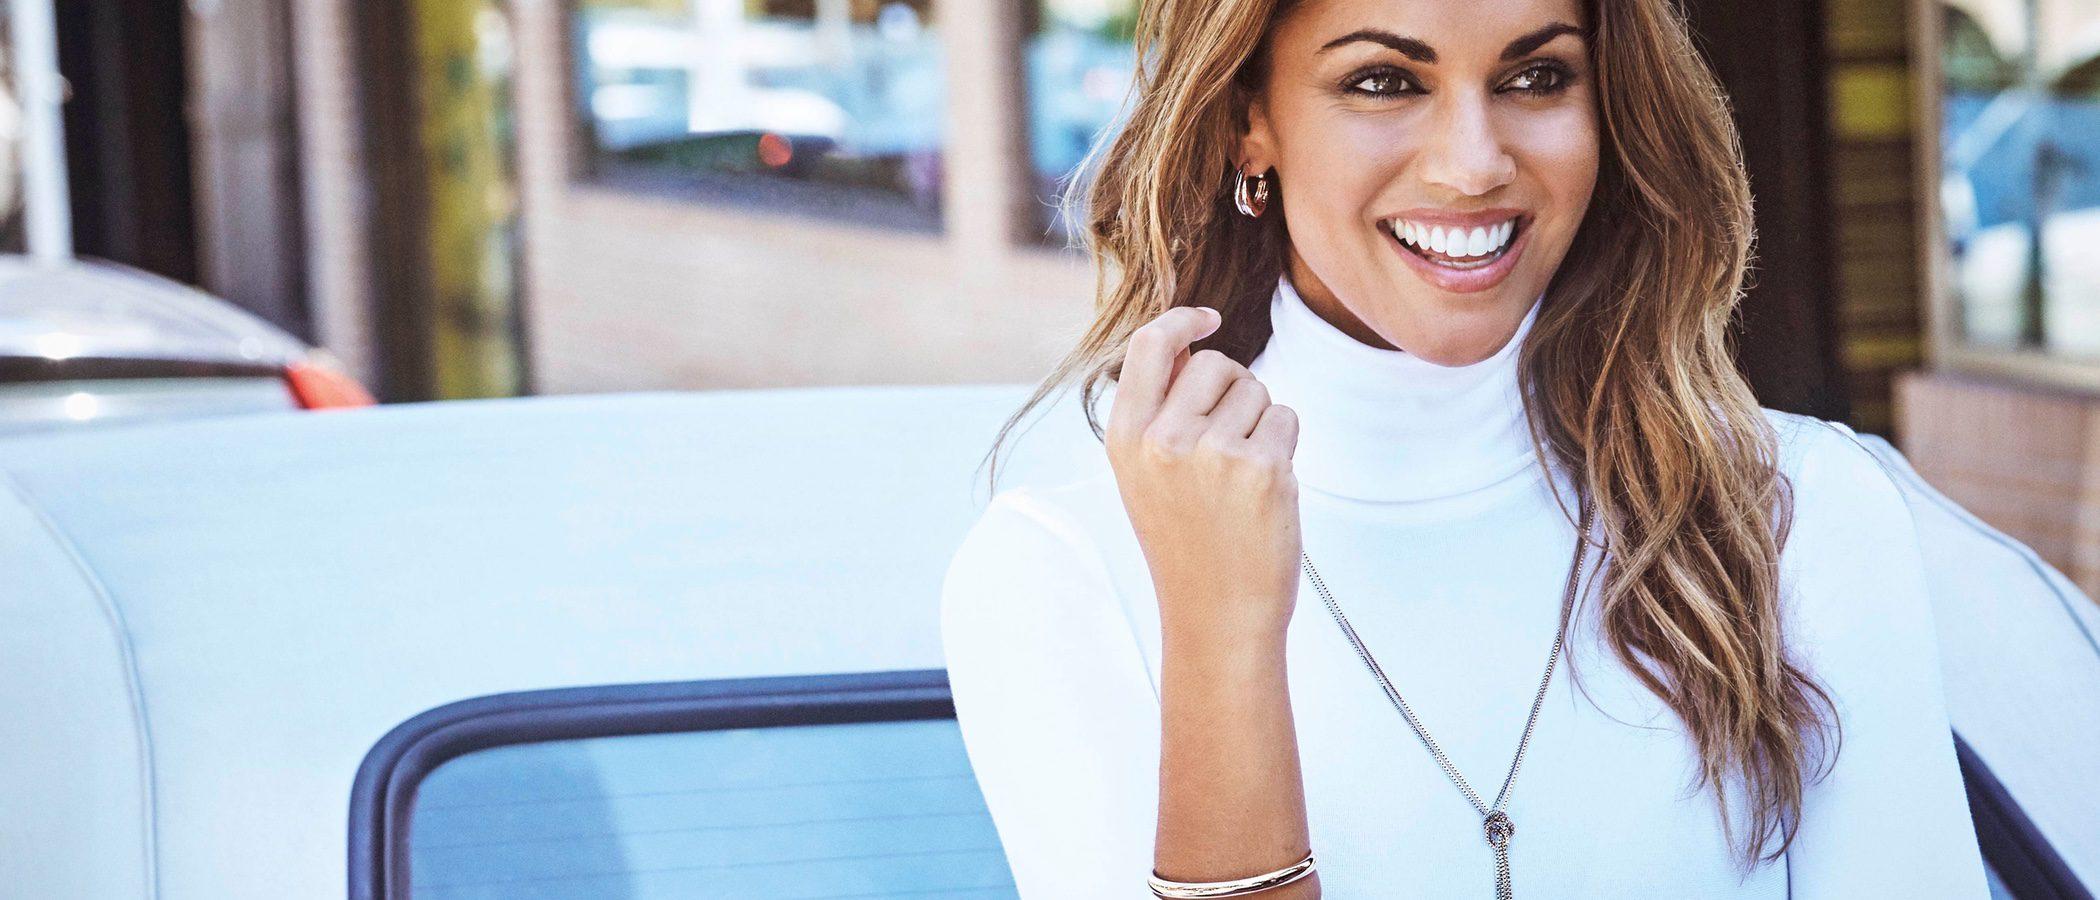 Lara Álvarez se estrena como embajadora de Luxenter para este otoño/invierno 2017/2018